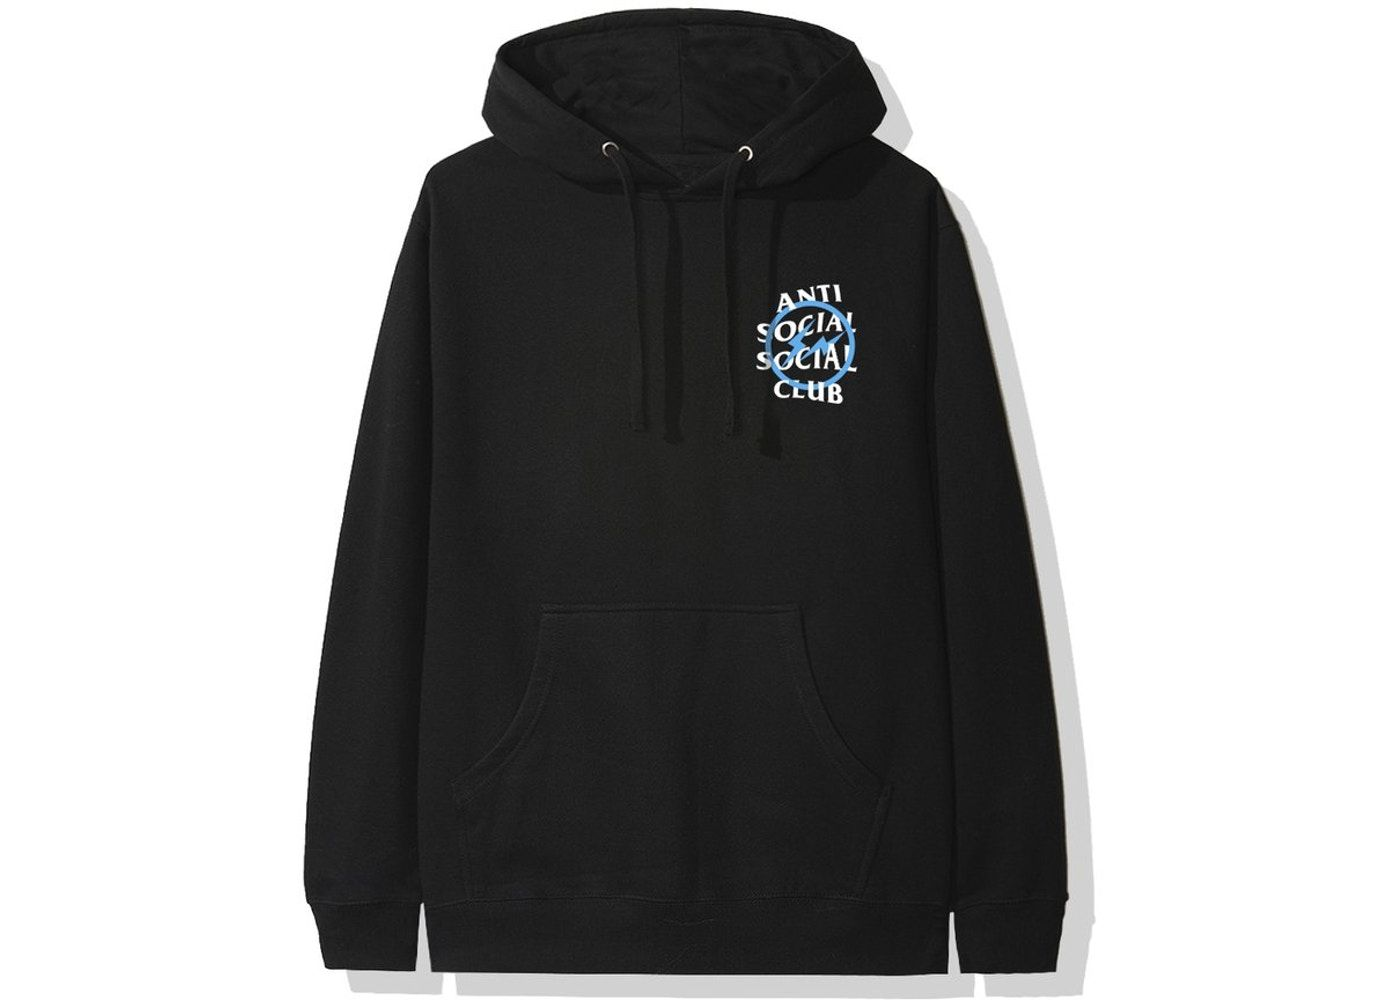 Anti Social Social Club X Fragment Blue Bolt Hoodie Fw19 Black In 2021 Hoodies Street Wear Anti Social Social Club